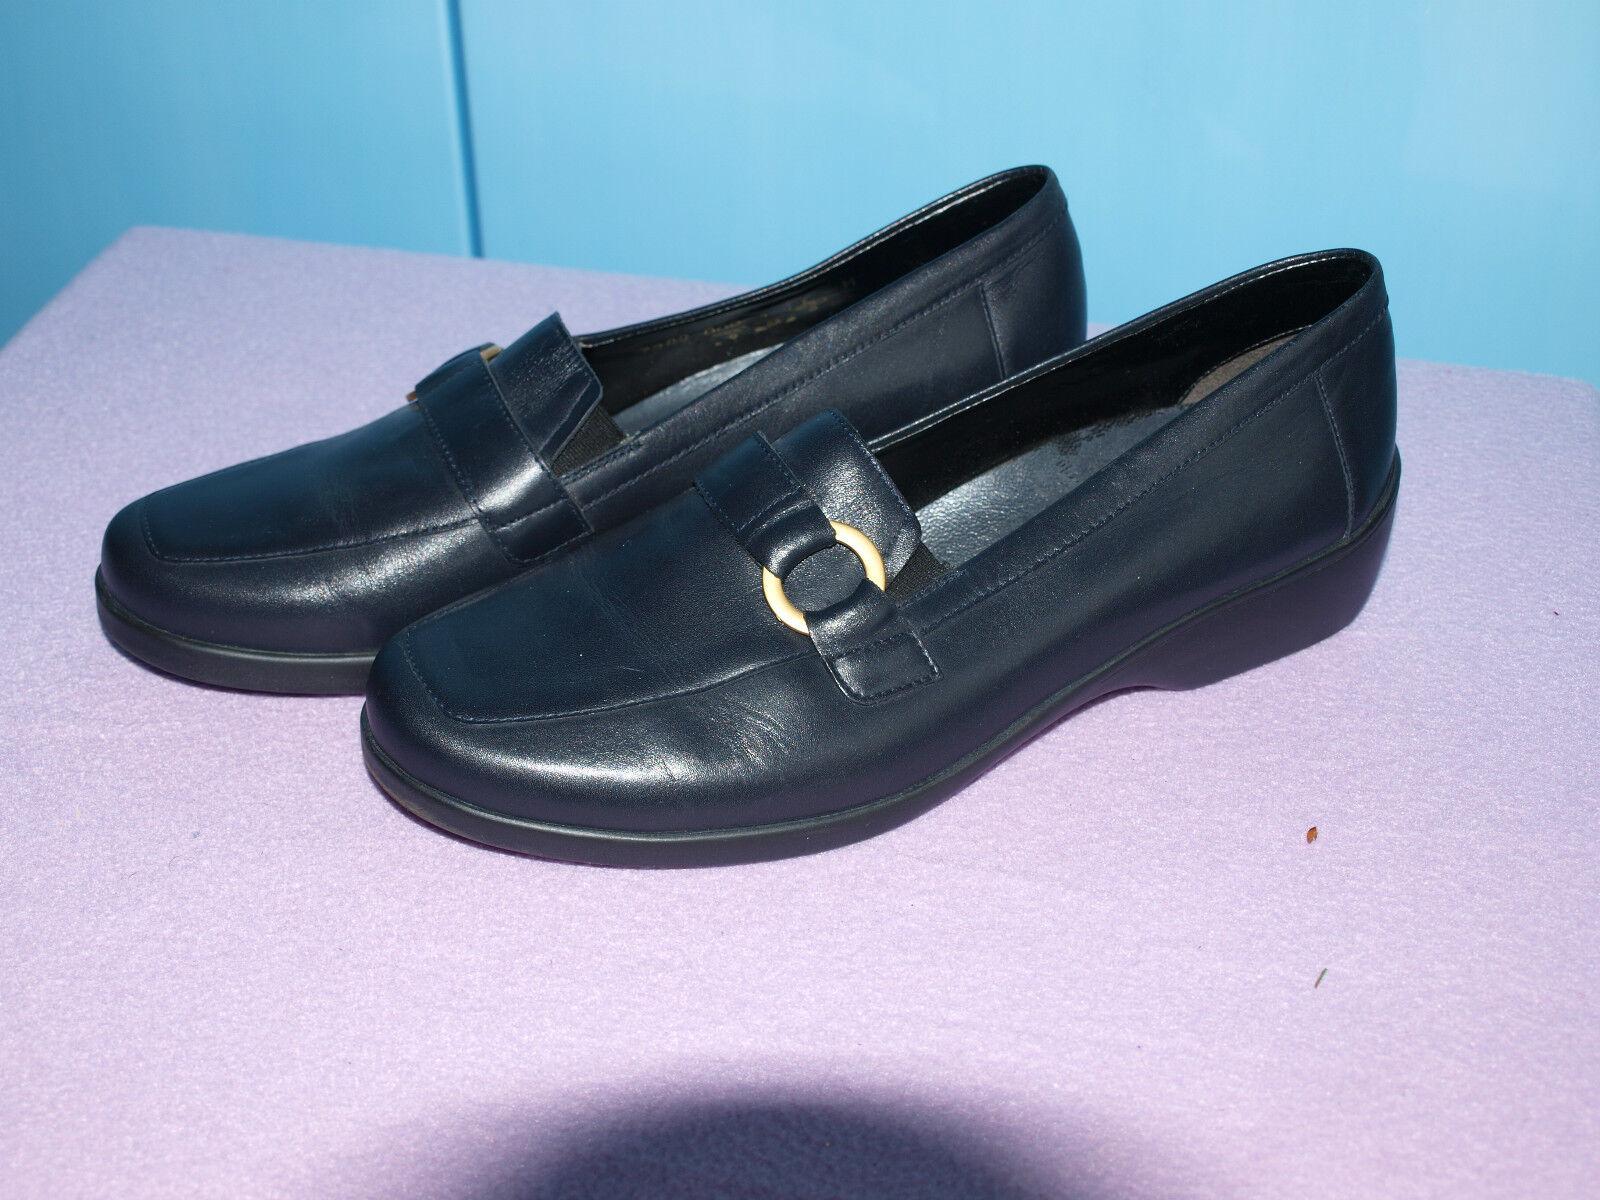 Damenschuhe schwarz Meisl Comfort Schuh Gr 7